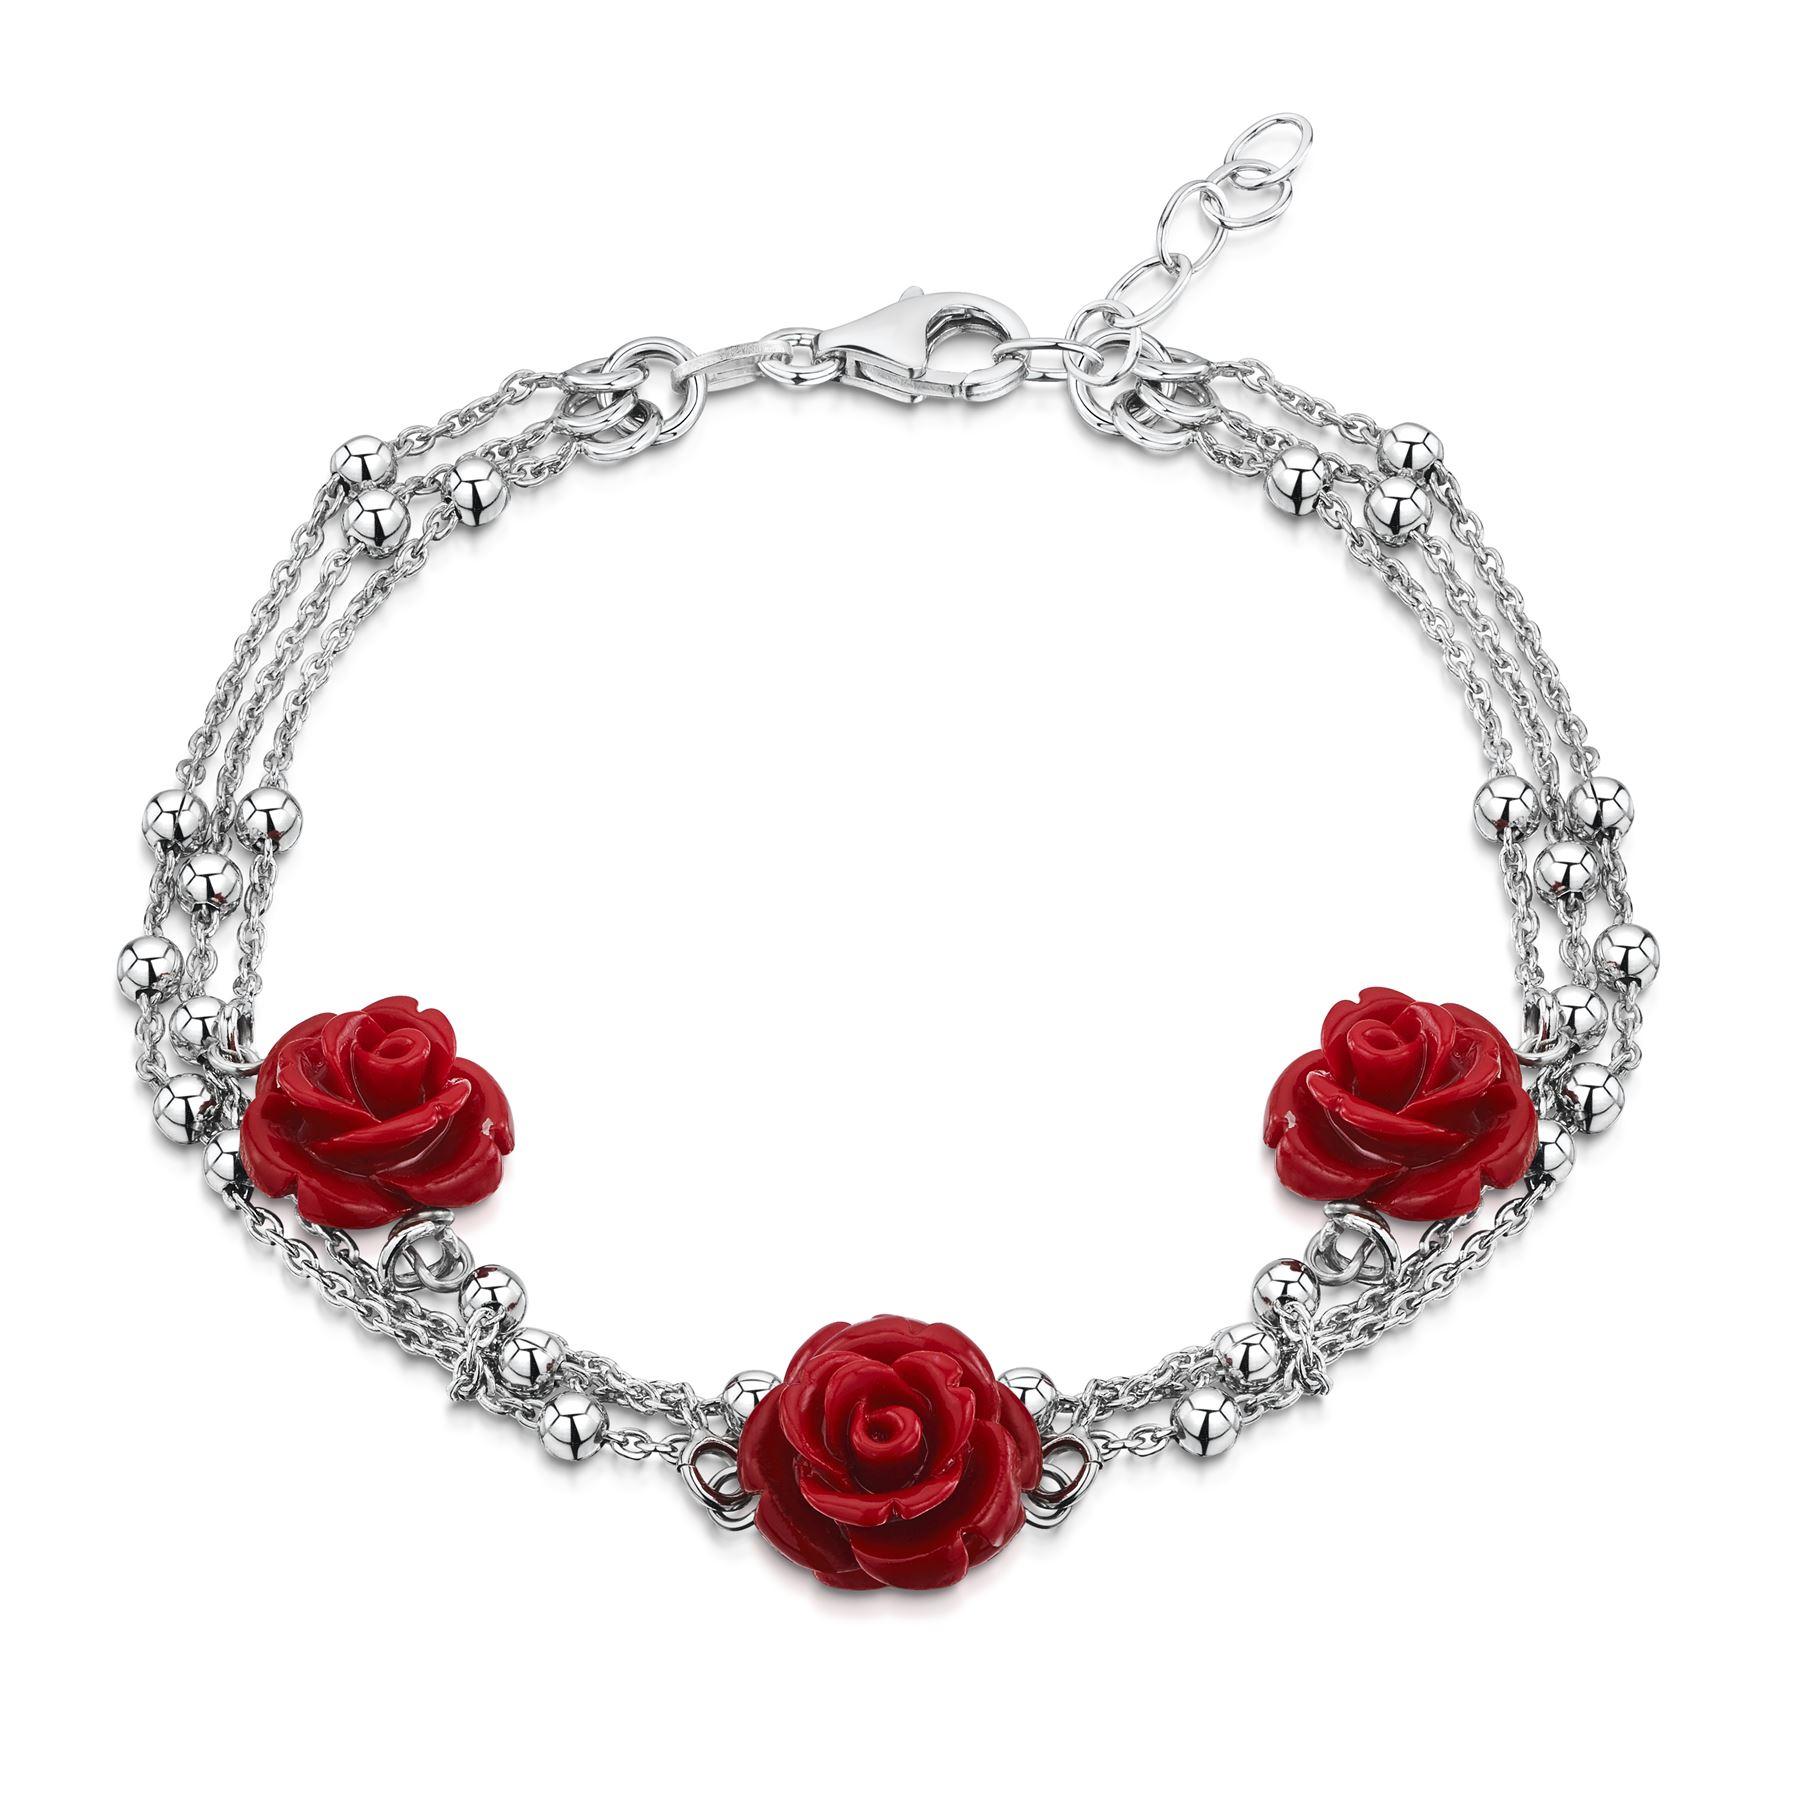 Amberta-Jewelry-925-Sterling-Silver-Adjustable-Bracelet-Italian-Bangle-for-Women thumbnail 23